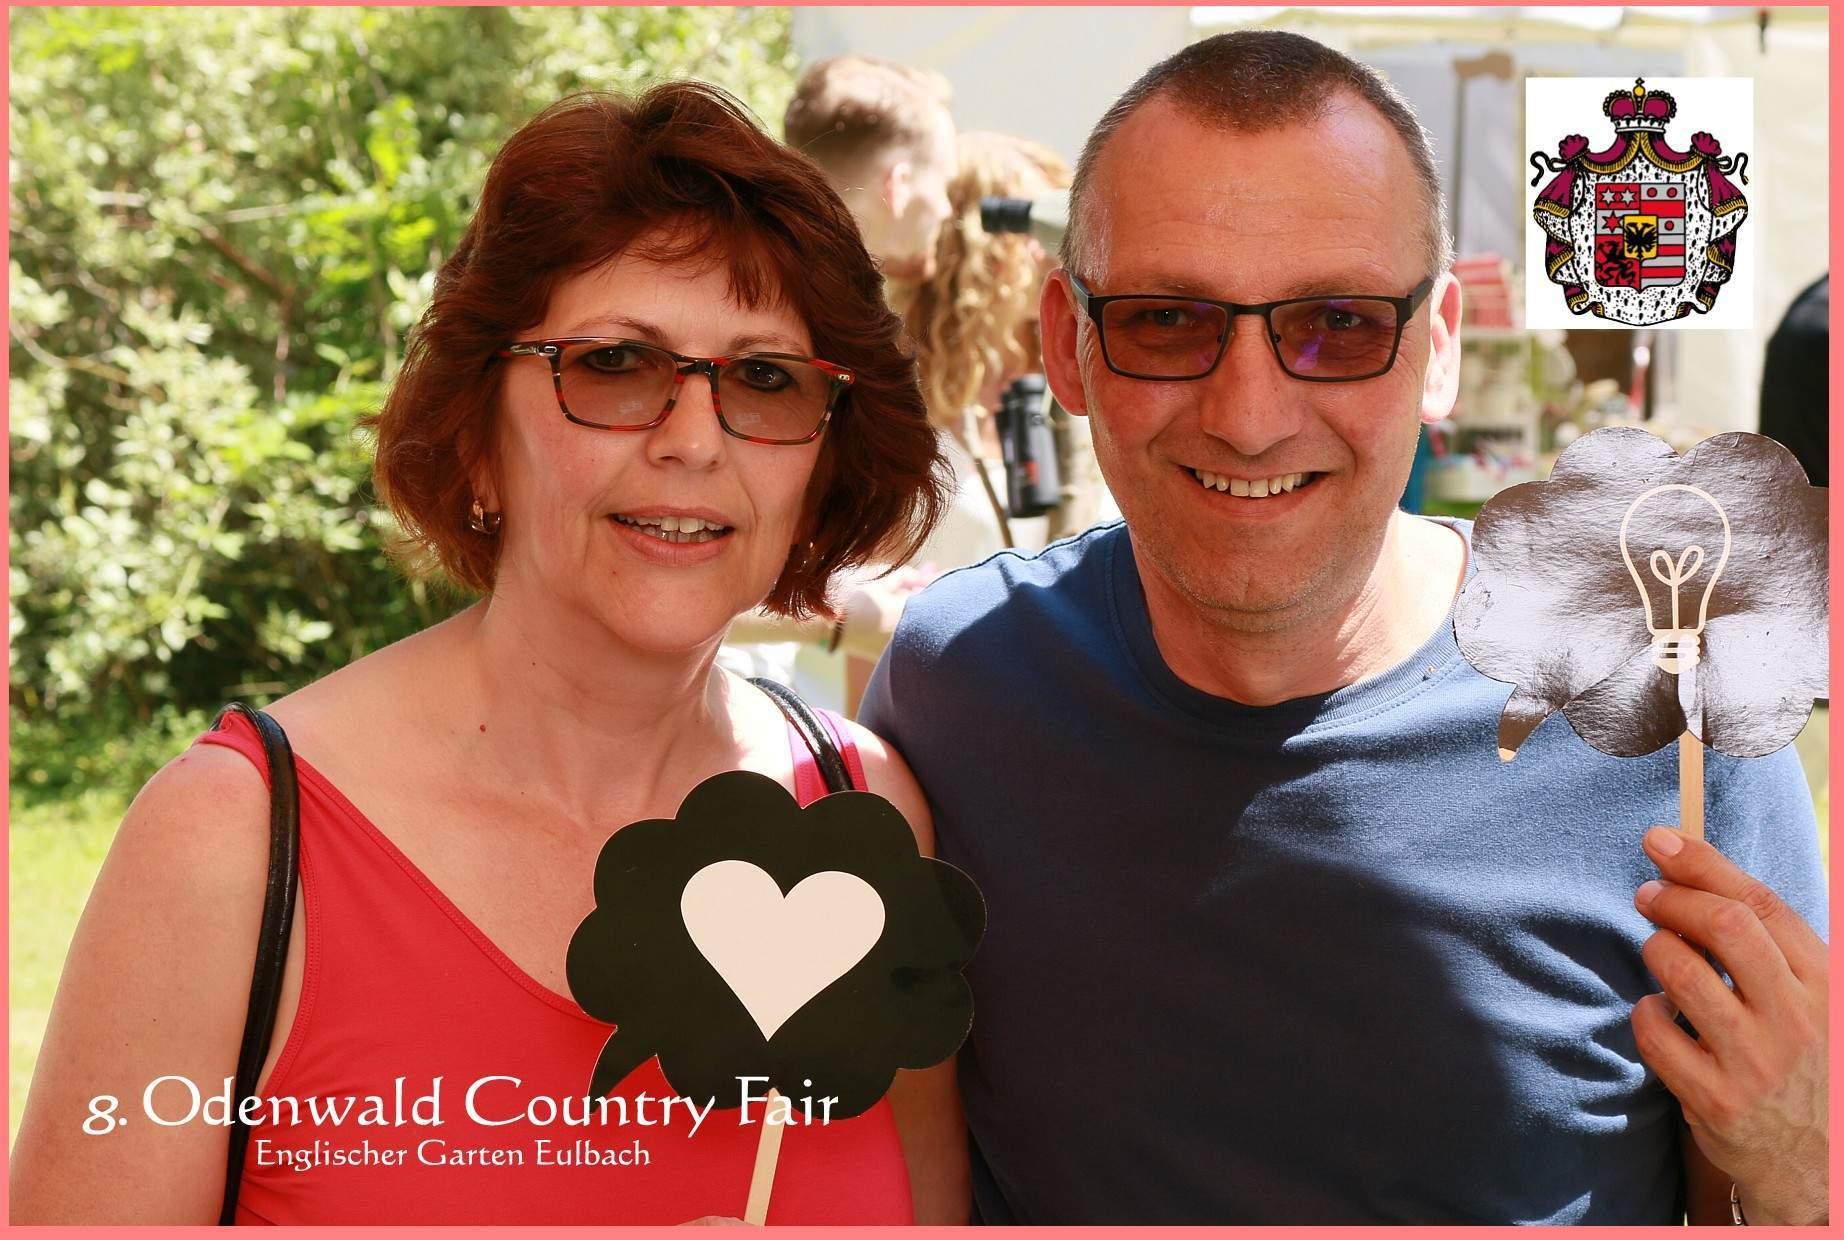 englischer garten eulbach inspirierend 11 odenwald country fair vom 11 bis 14 juni 2020 of englischer garten eulbach